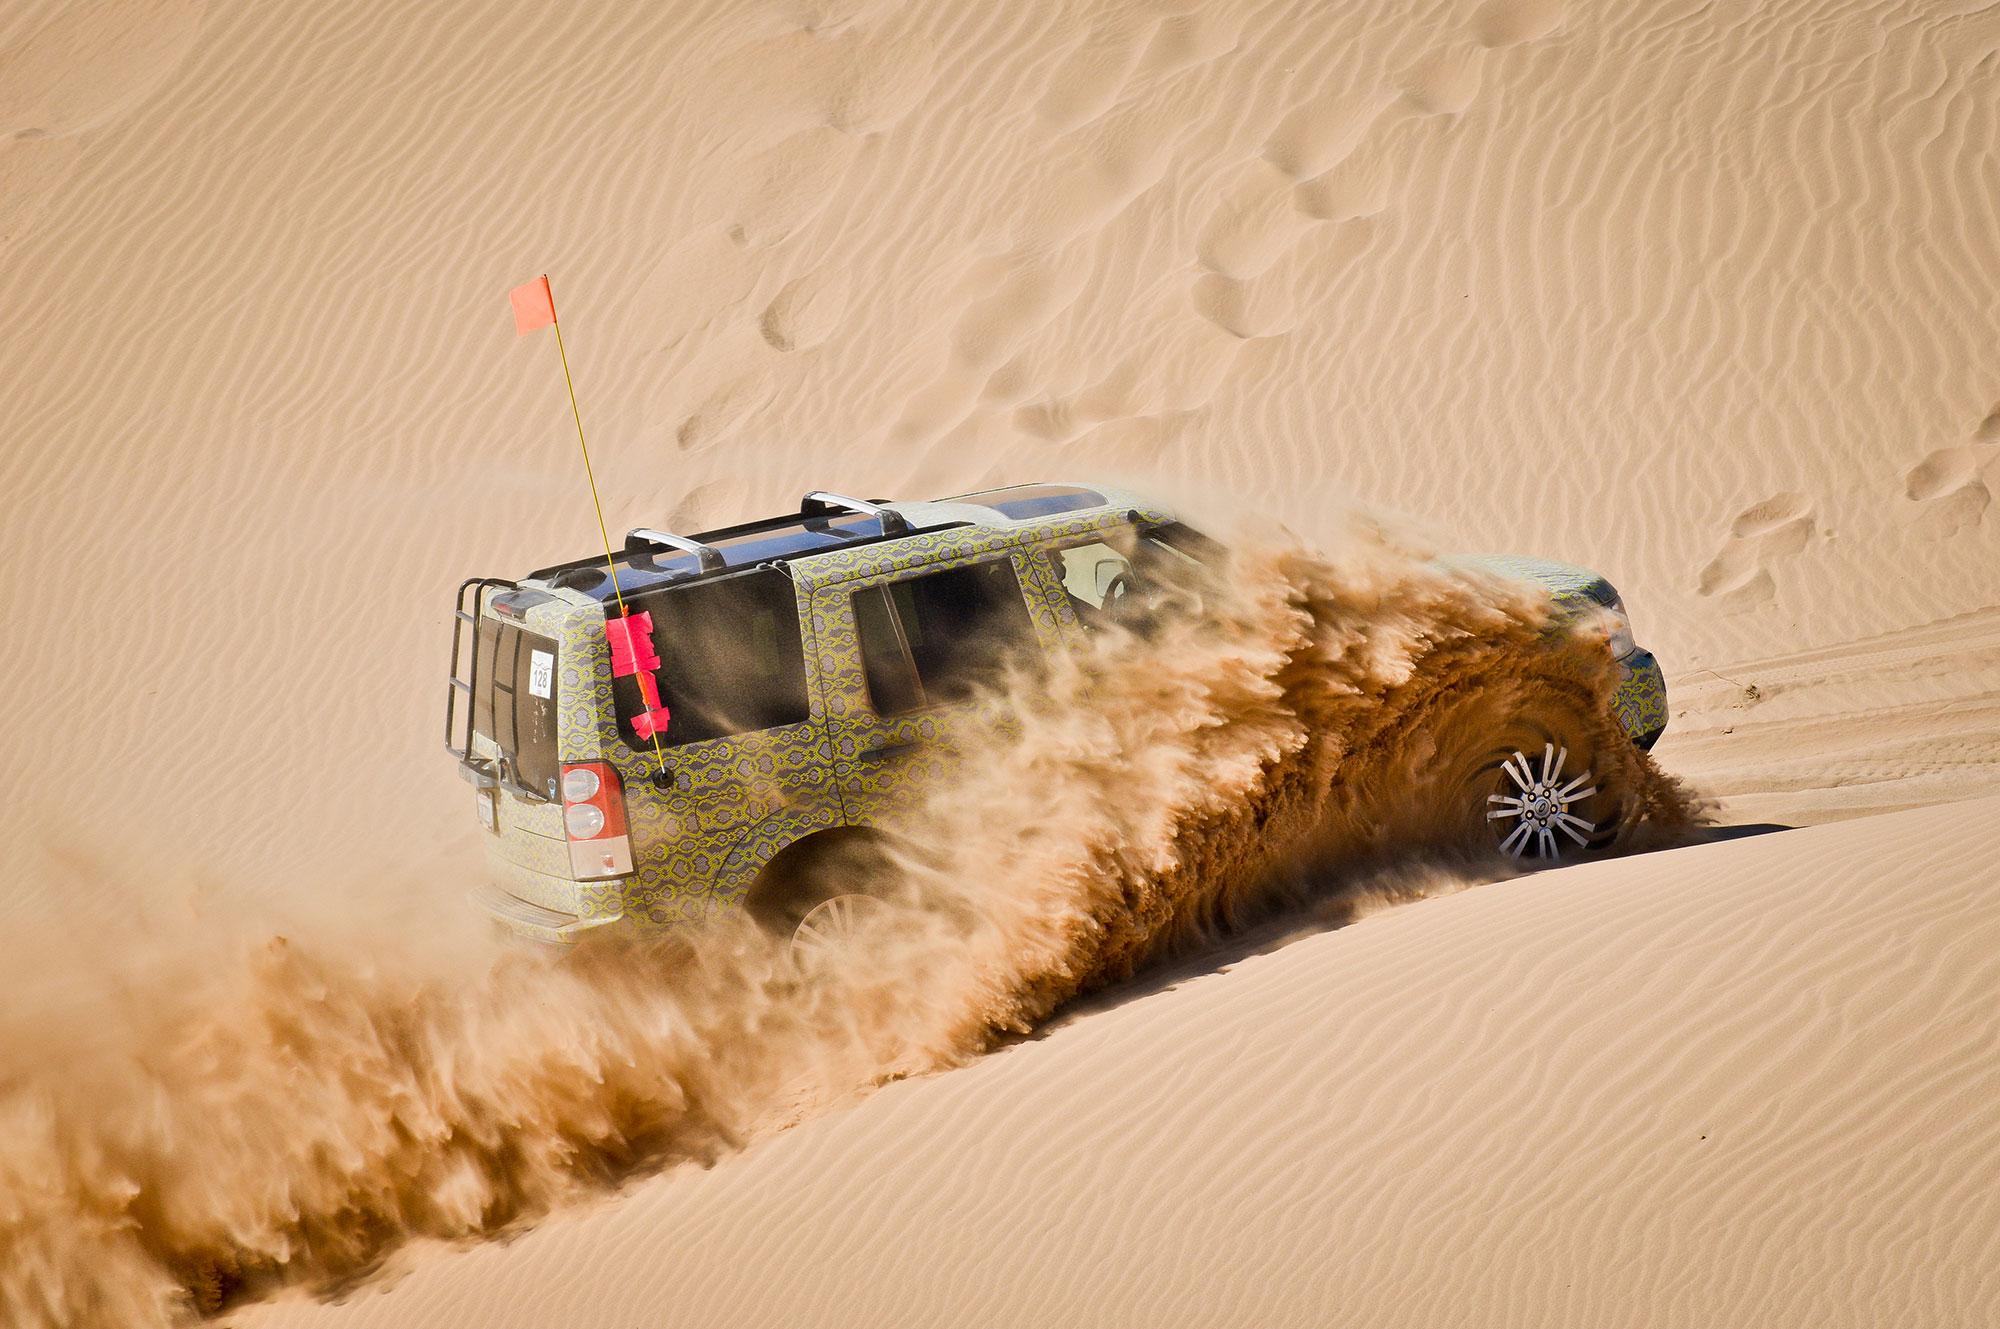 2016 rebelle rally sidewinder dunes